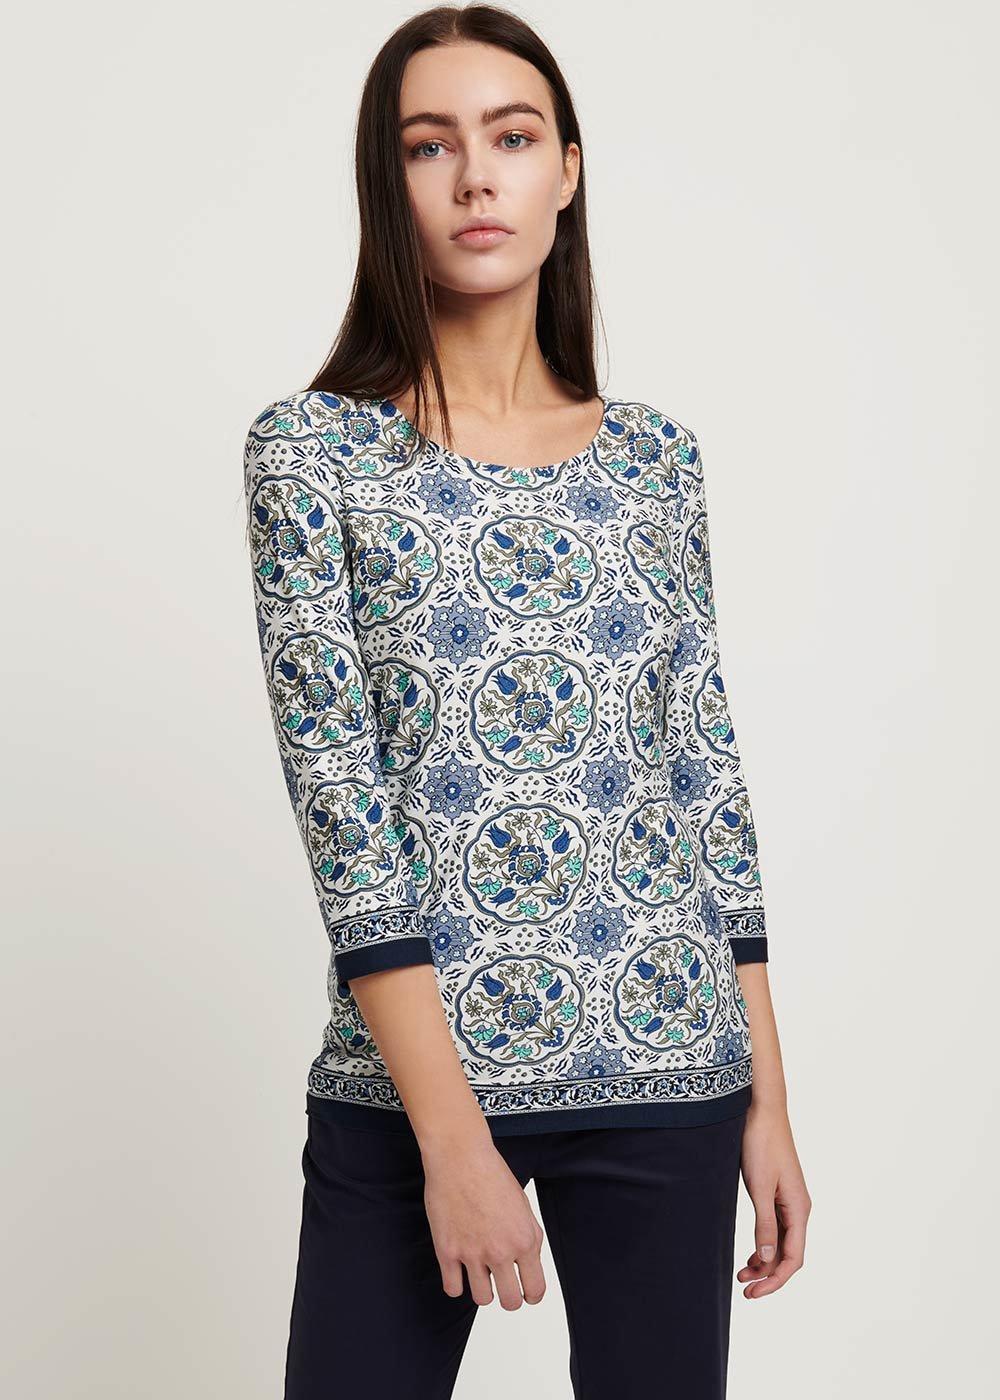 Sheena patterned T-shirt - Avion / White / Fantasia - Woman